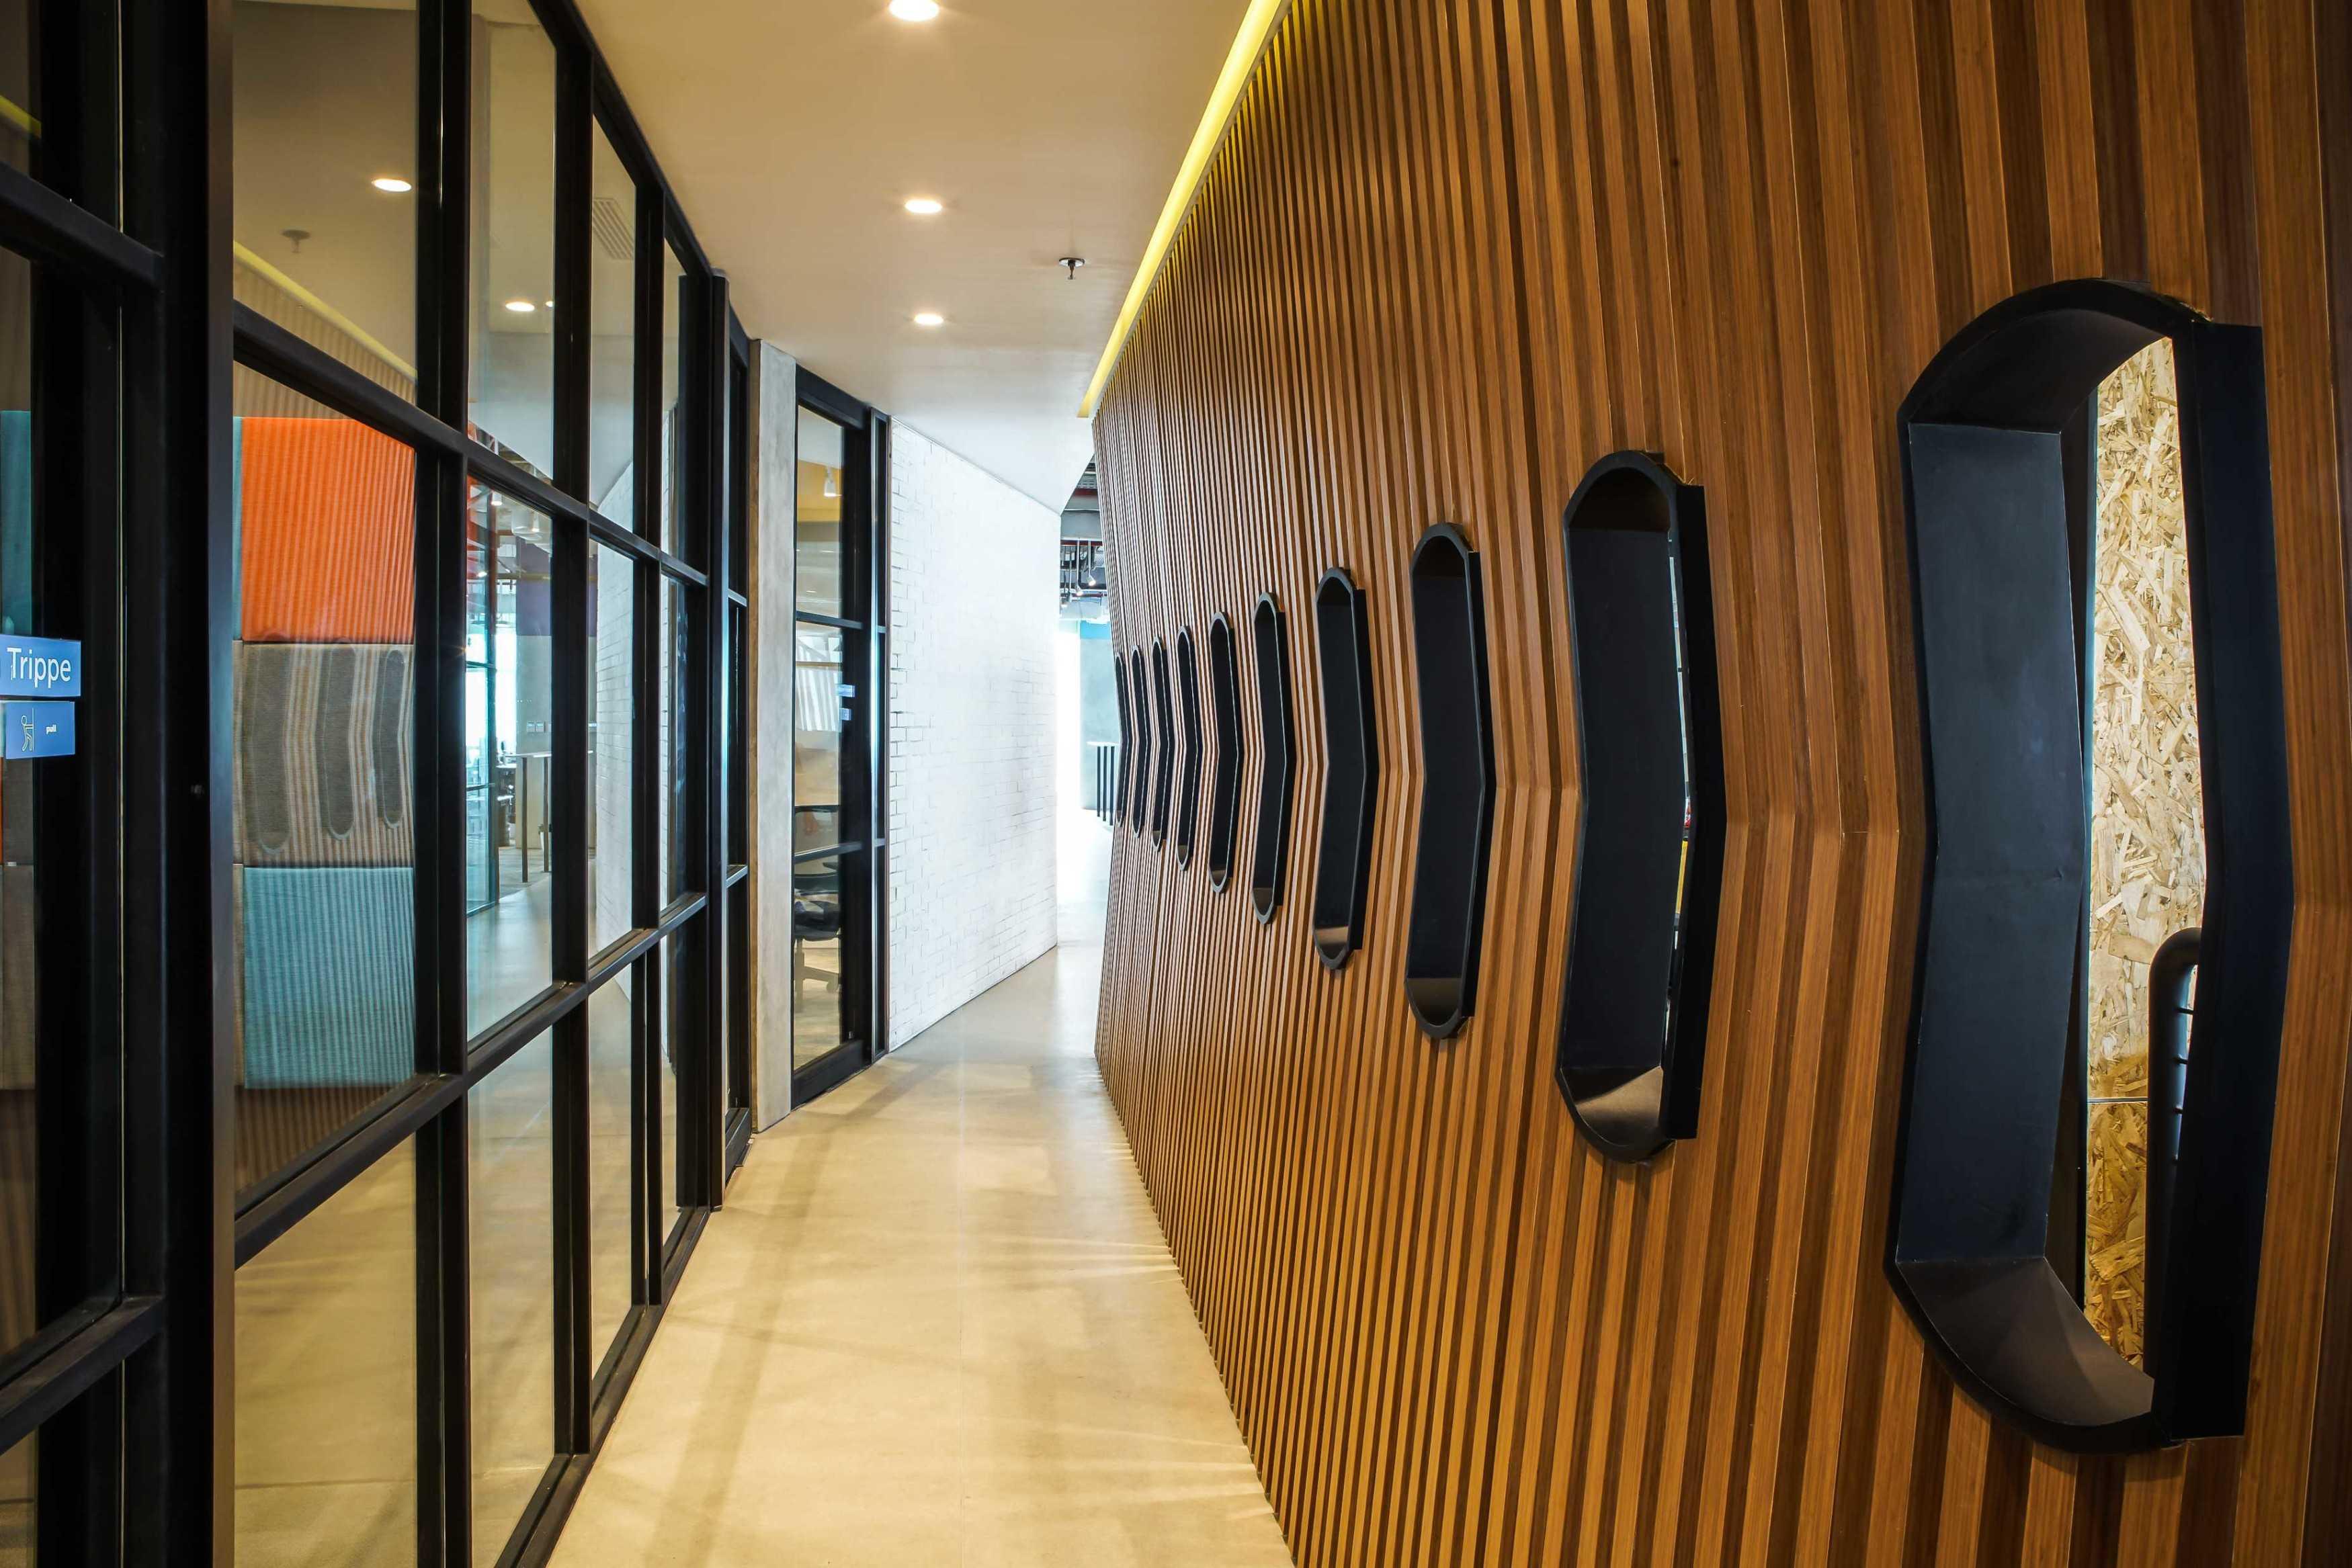 Design Intervention Tech Company Floor 19 Jakarta, Daerah Khusus Ibukota Jakarta, Indonesia Jakarta, Daerah Khusus Ibukota Jakarta, Indonesia Design-Intervention-Traveloka-19Th-Floor   71019